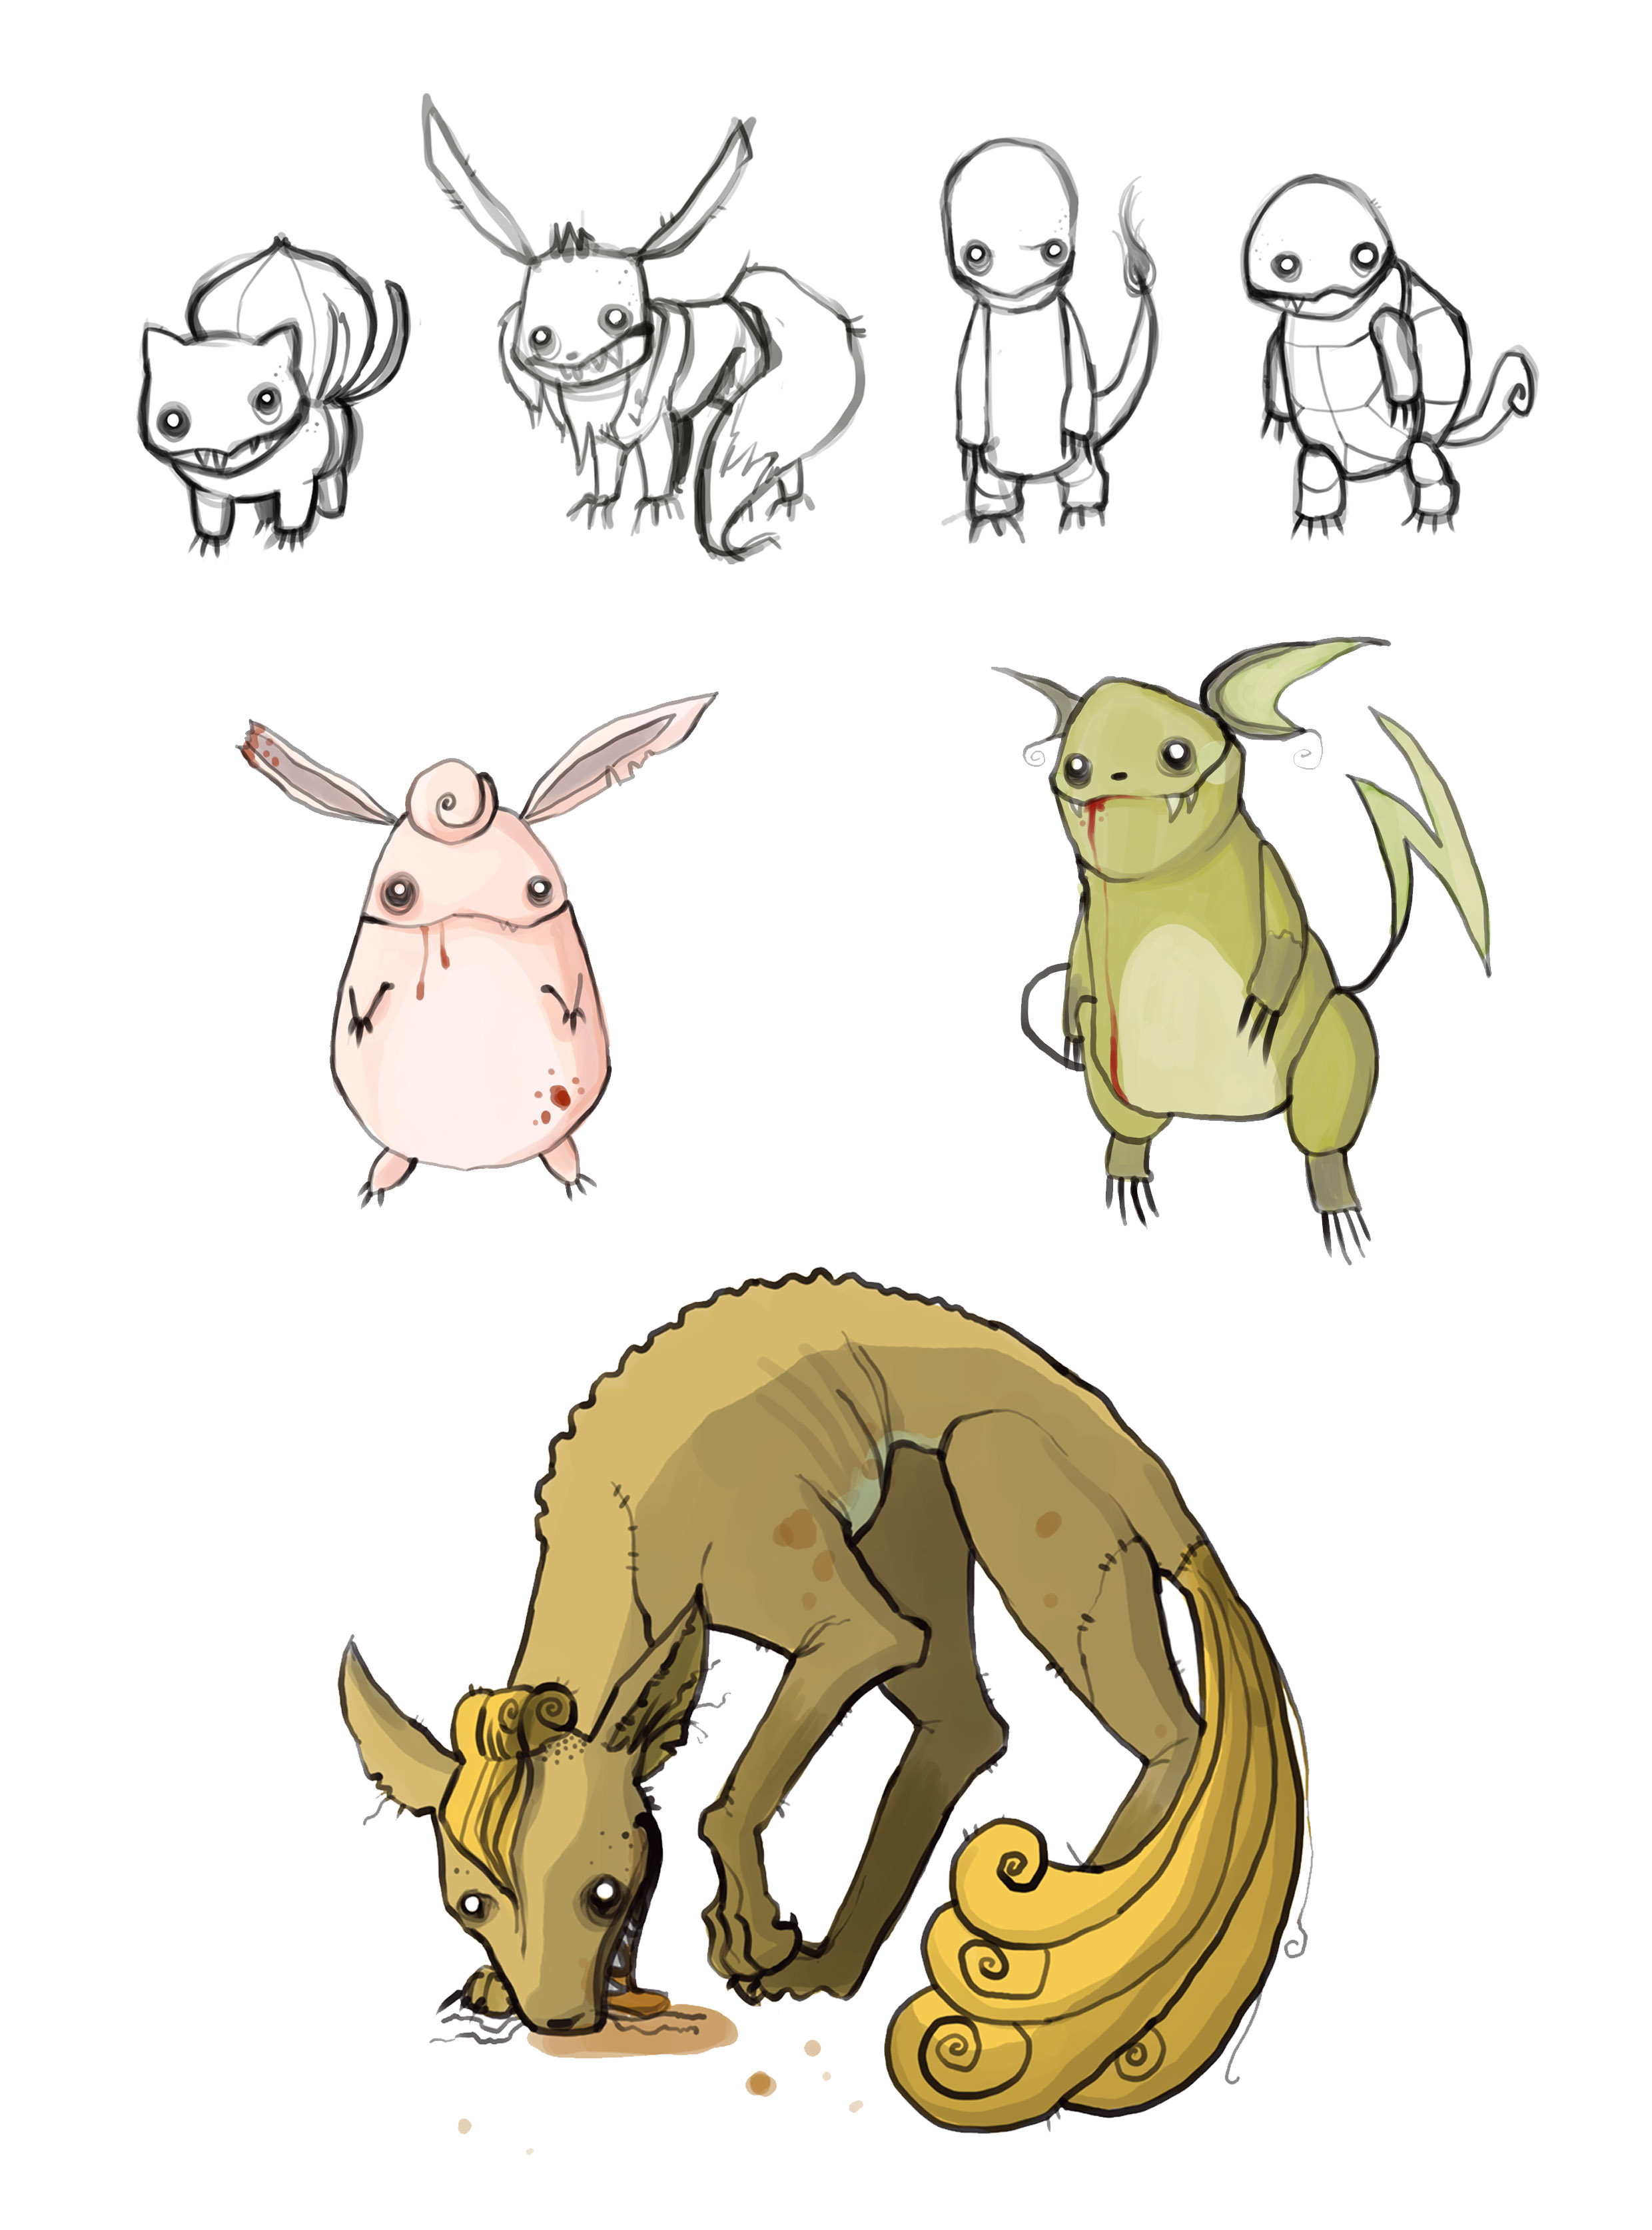 Zombie Pokemons